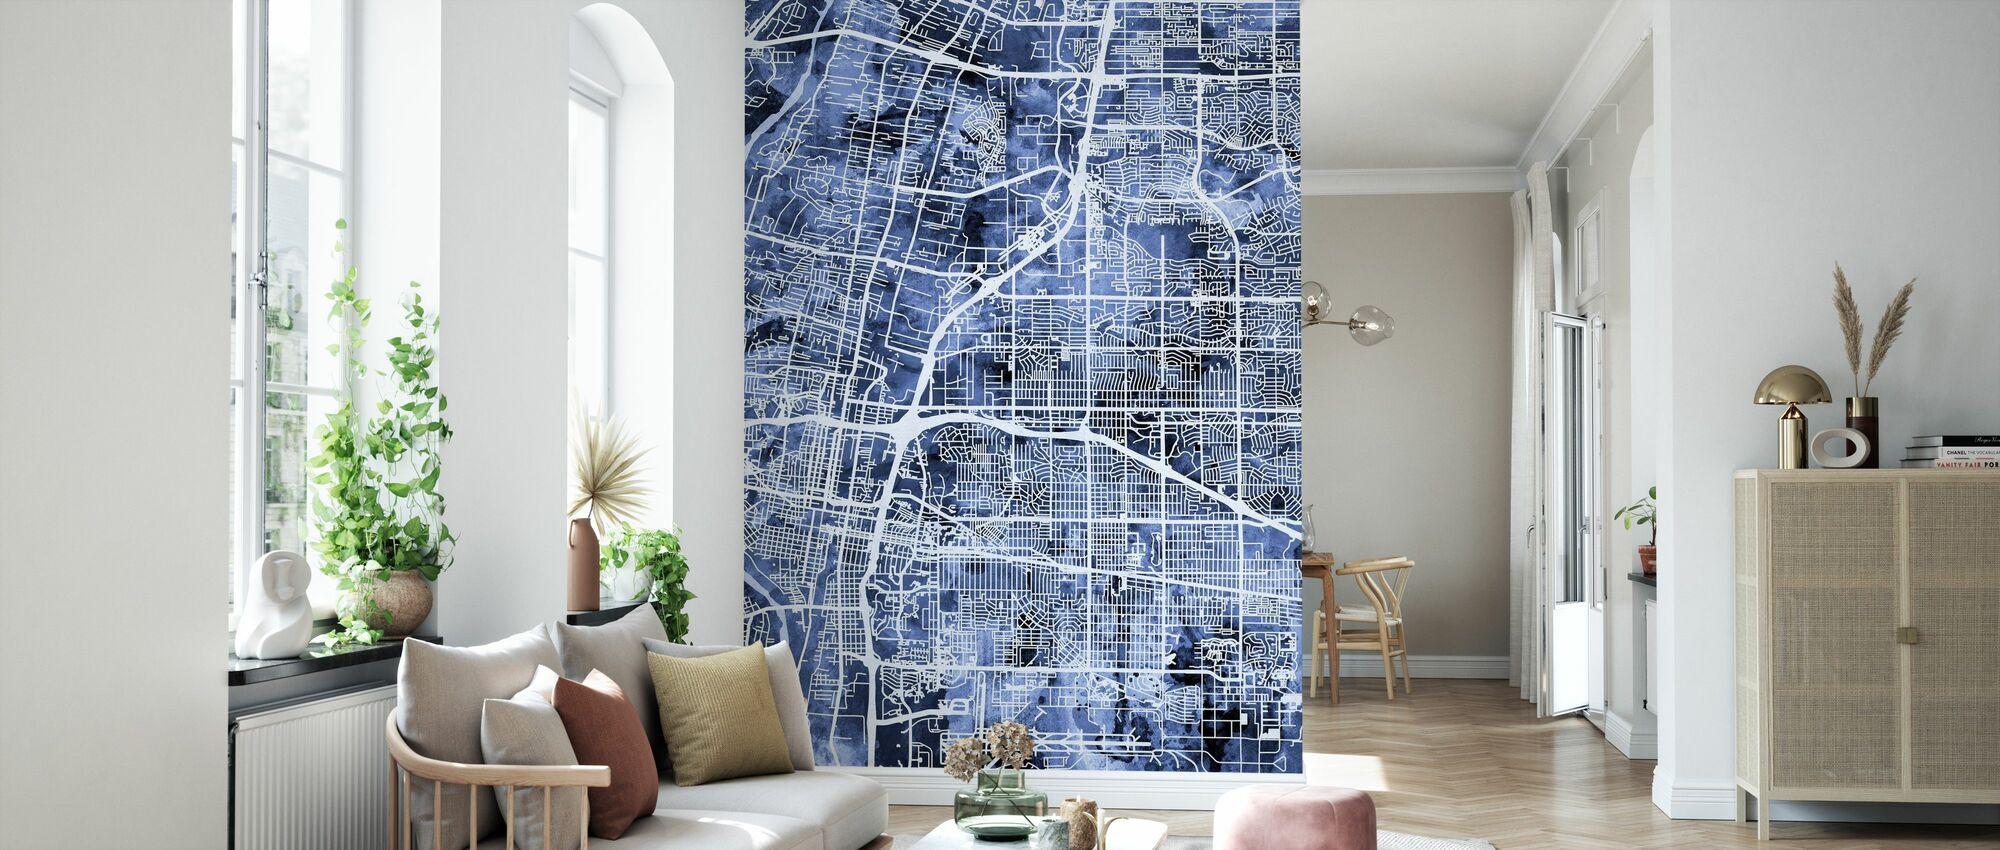 Albuquerque New Mexico City Street Map - Wallpaper - Living Room